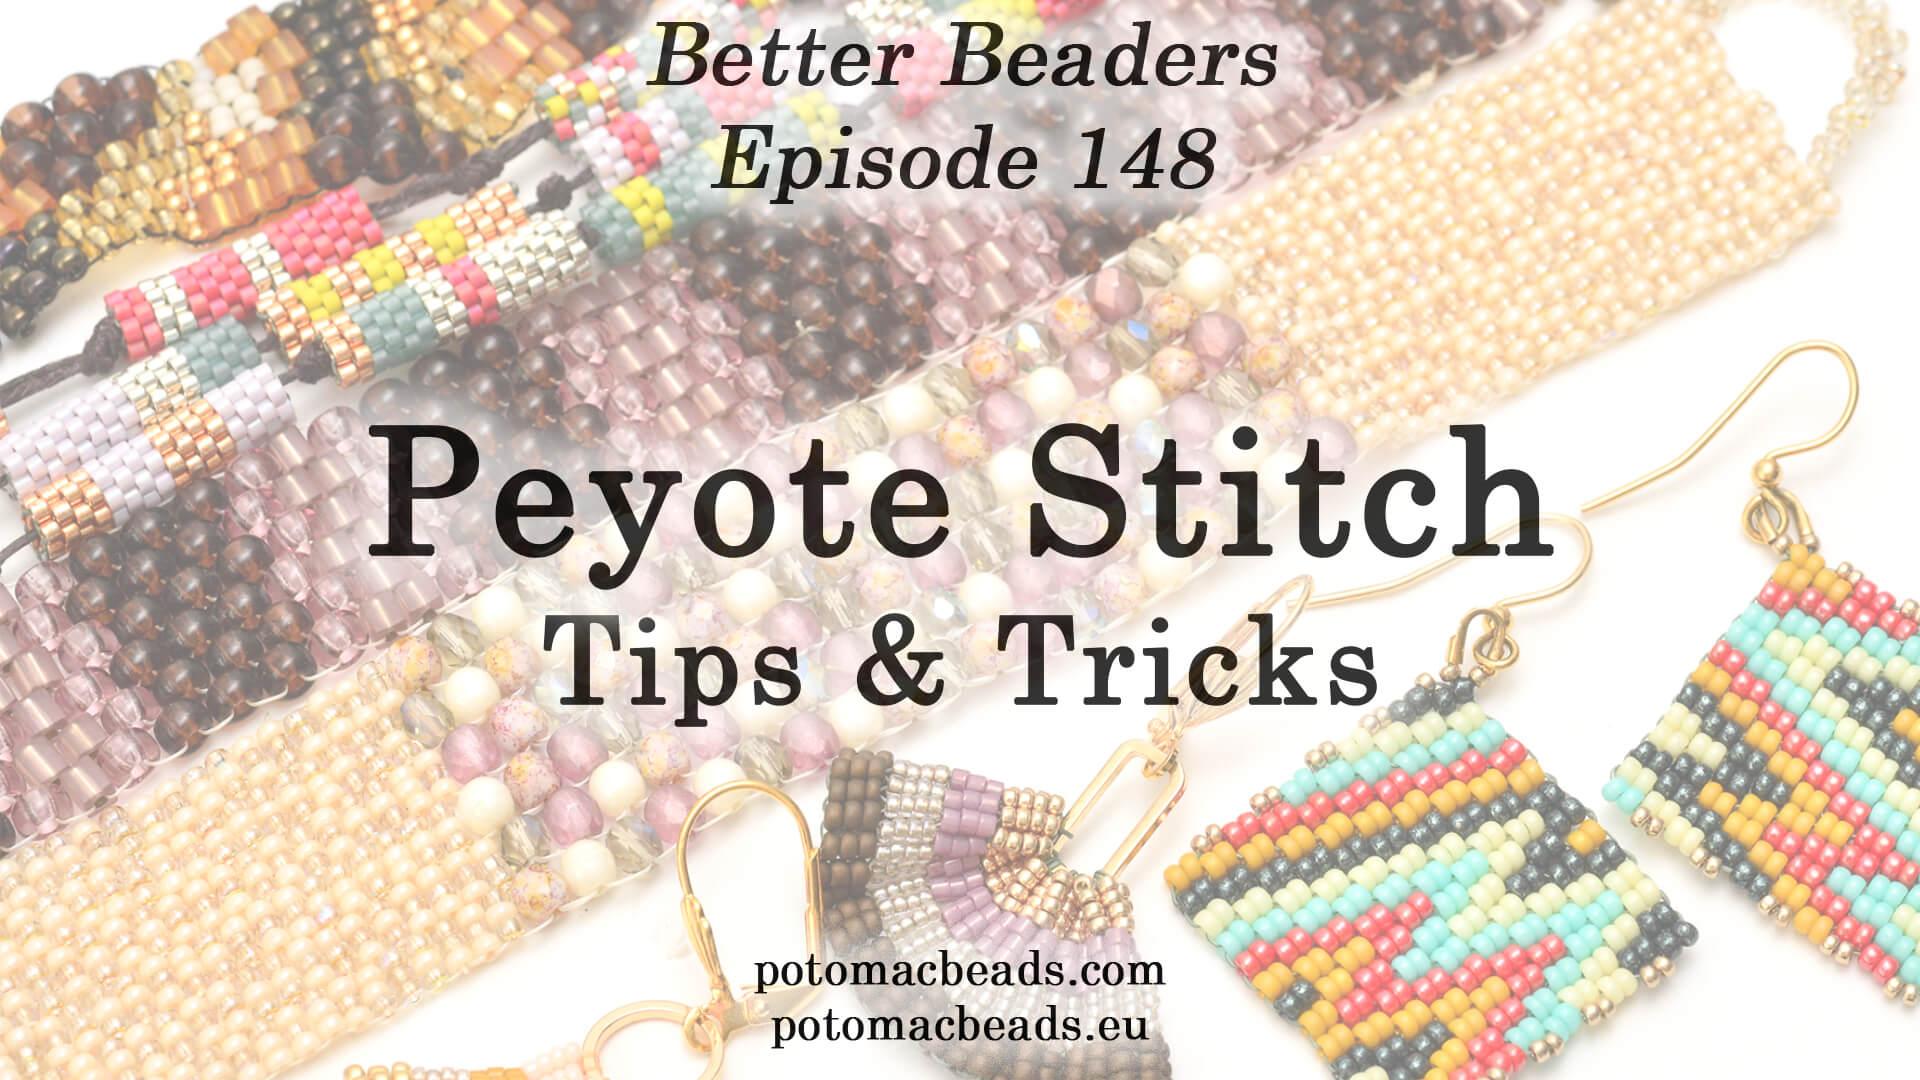 How to Bead / Better Beader Episodes / Better Beader Episode 148 - Basic Peyote Tips & Tricks